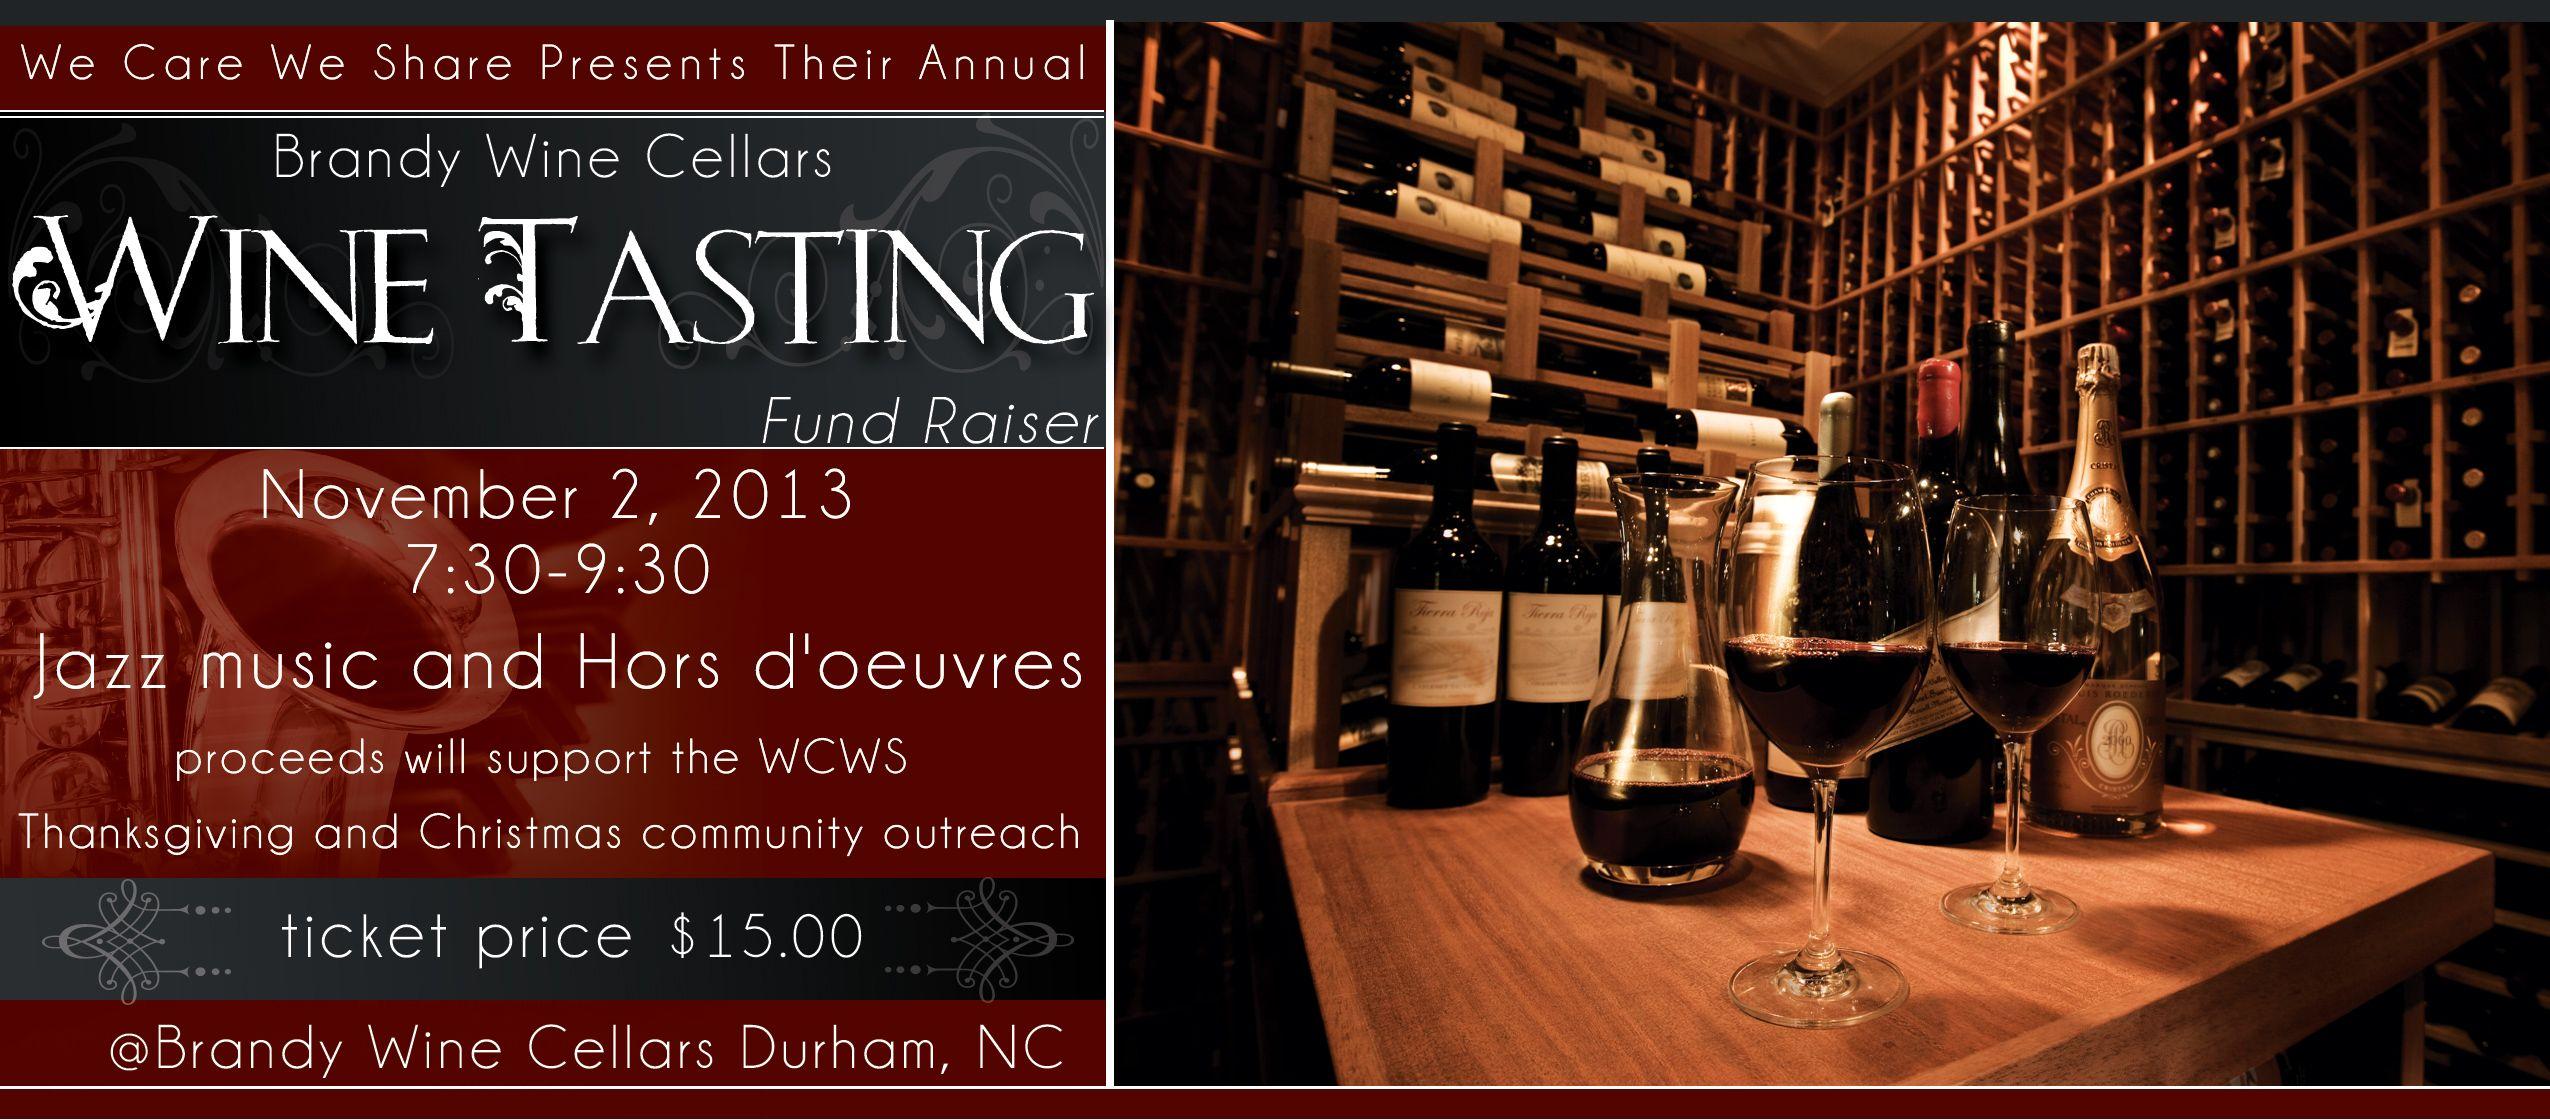 We Care We Share Wine Tasting Fundraising Event Wine Tasting Events Wine Tasting Fundraising Events